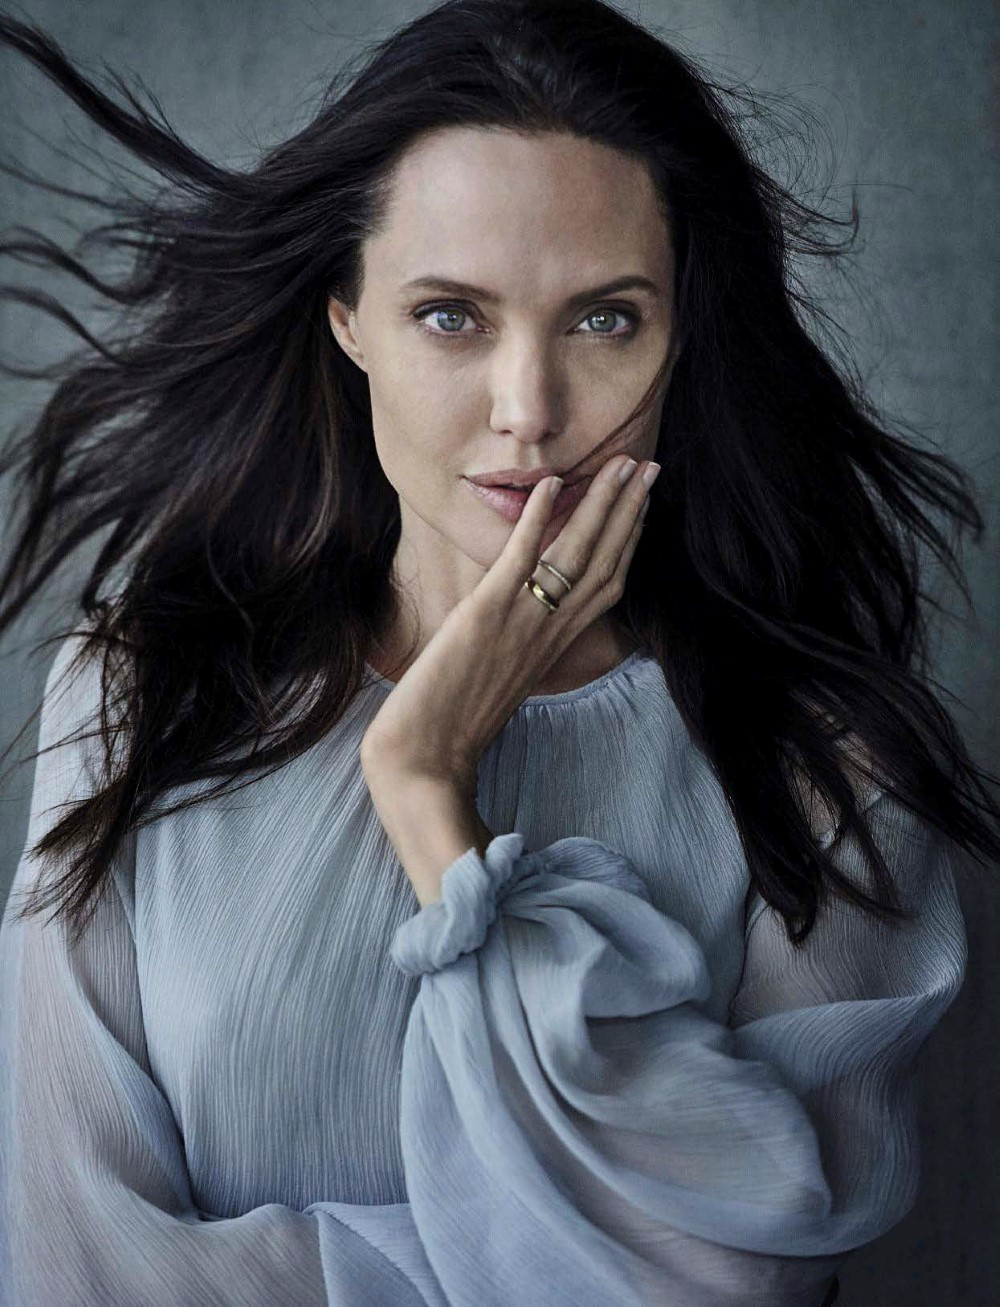 Vanity-Fair-Italia-November-2015-Angelina-Jolie-and-Brad-Pitt-by-Peter-Lindbergh-07.jpg